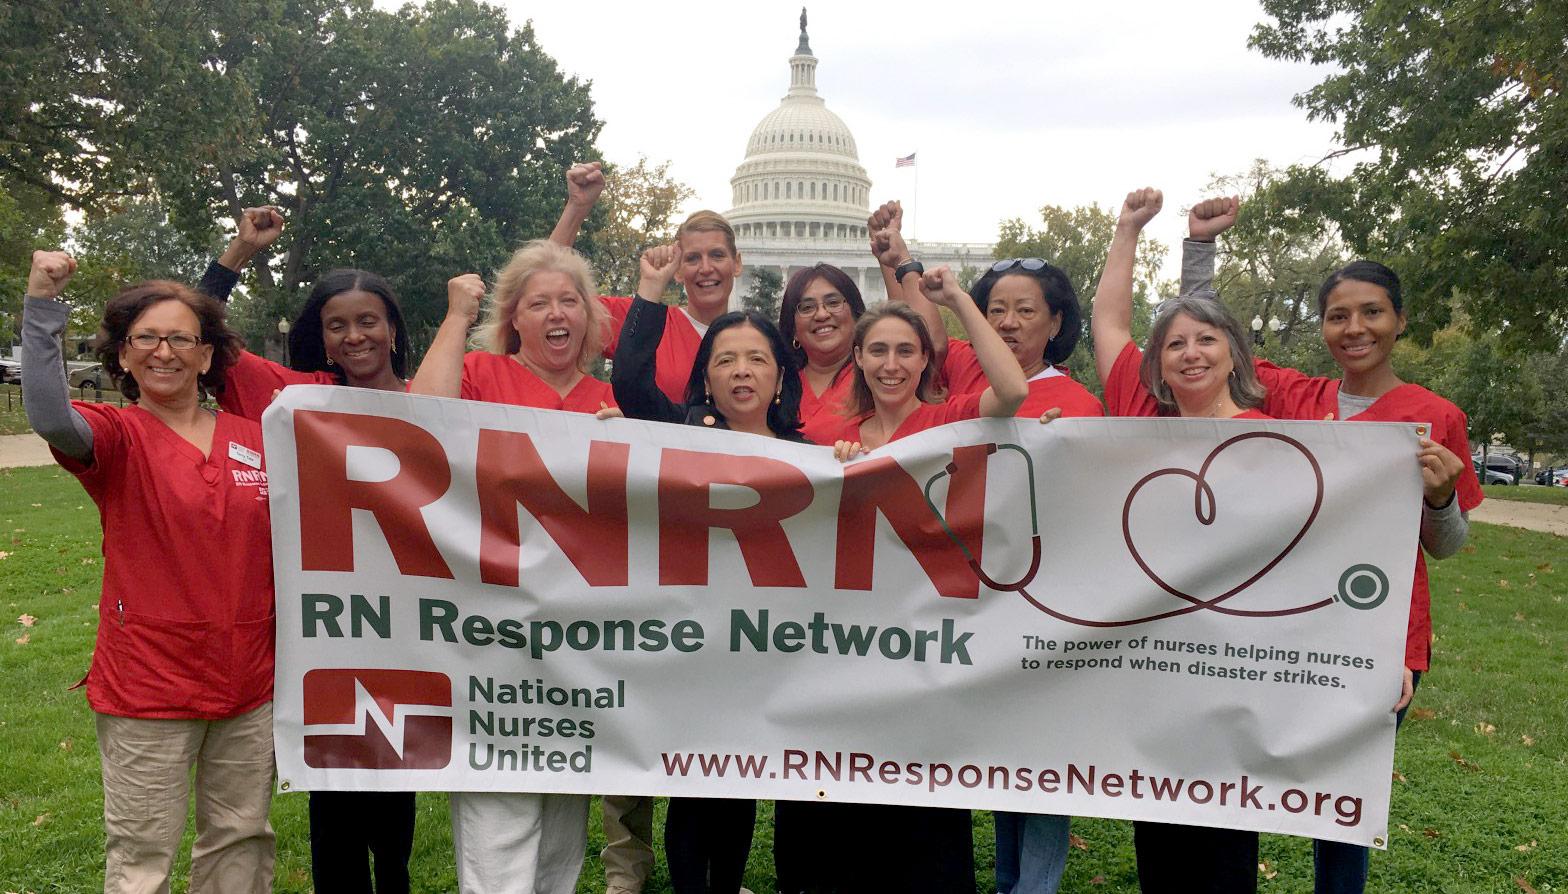 RNRN volunteers at US Capitol